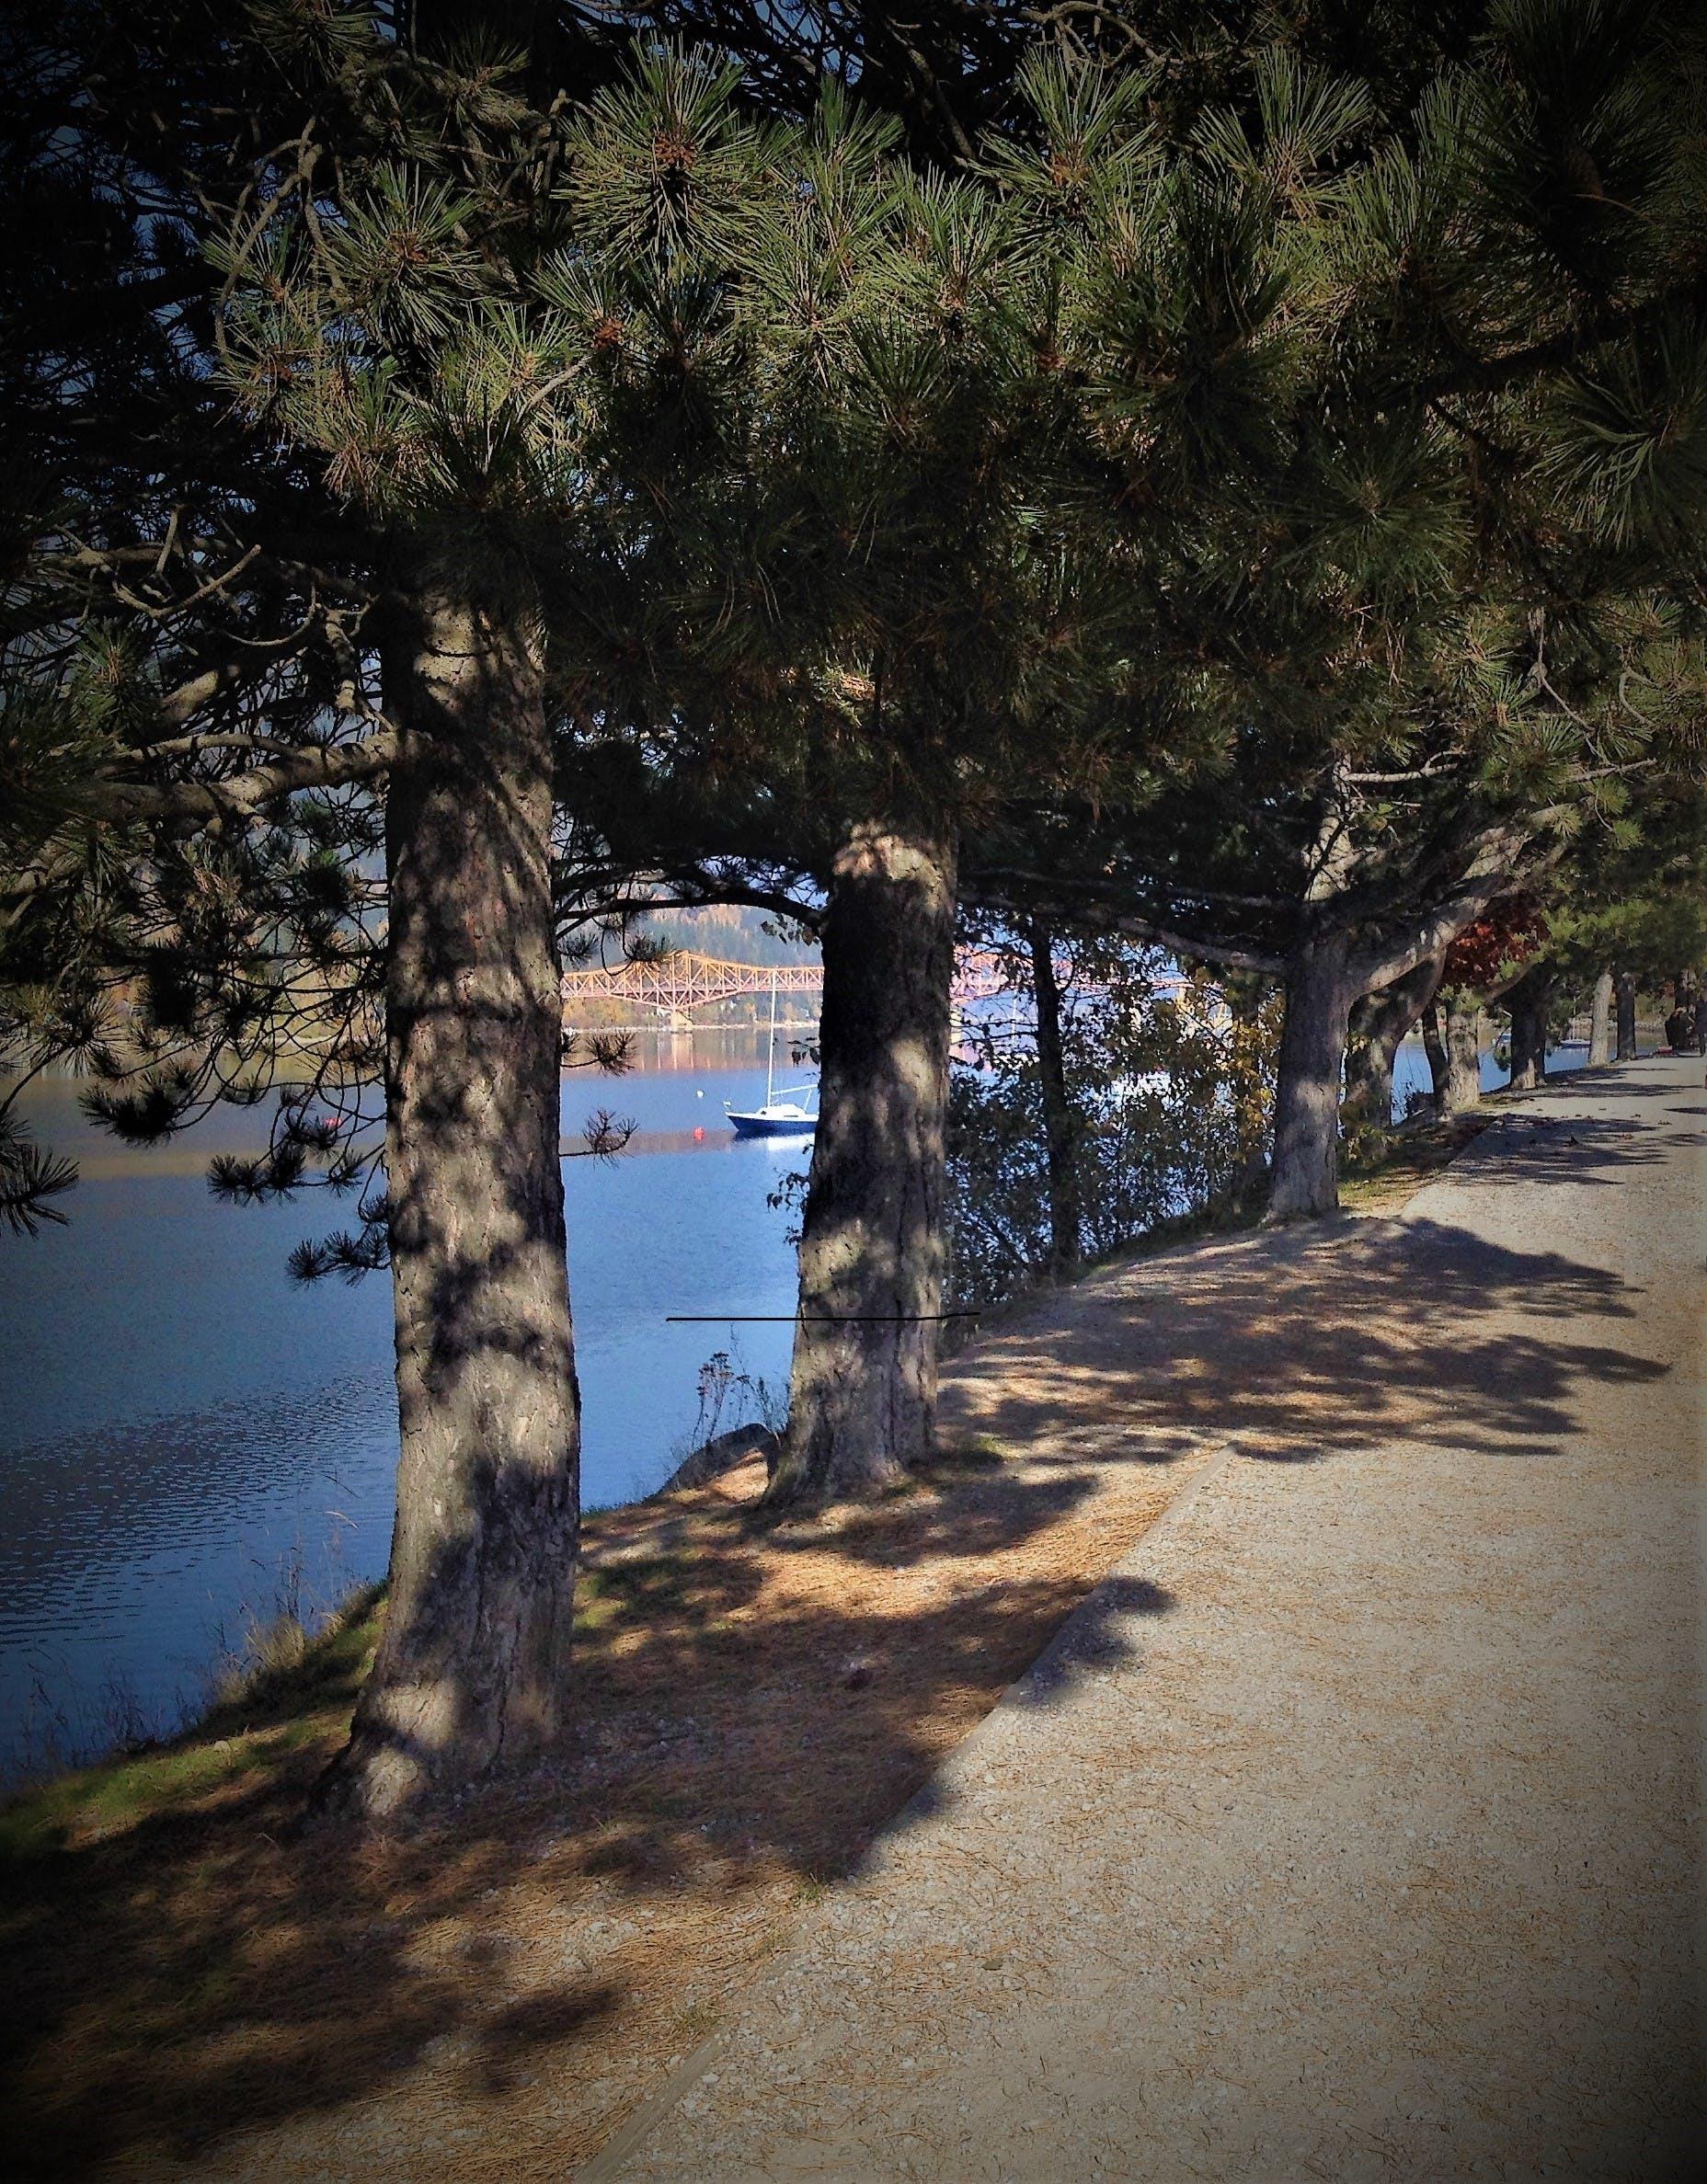 Free stock photo of Kootenay Lake, Nelson Bridge, pine trees, sailboat